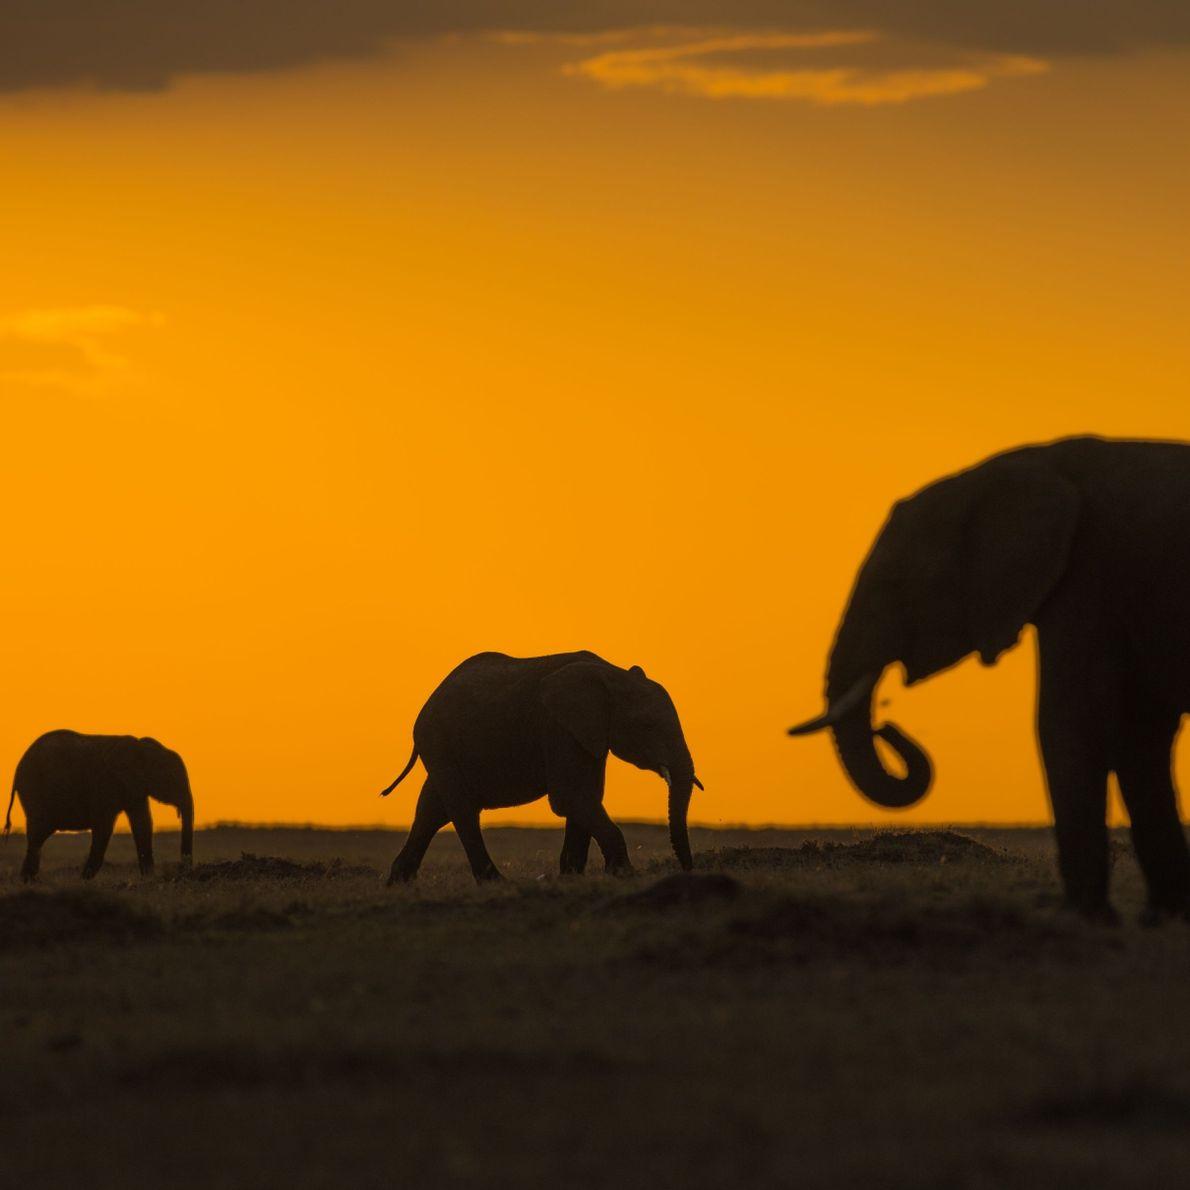 Elefantes contra sol nascendo